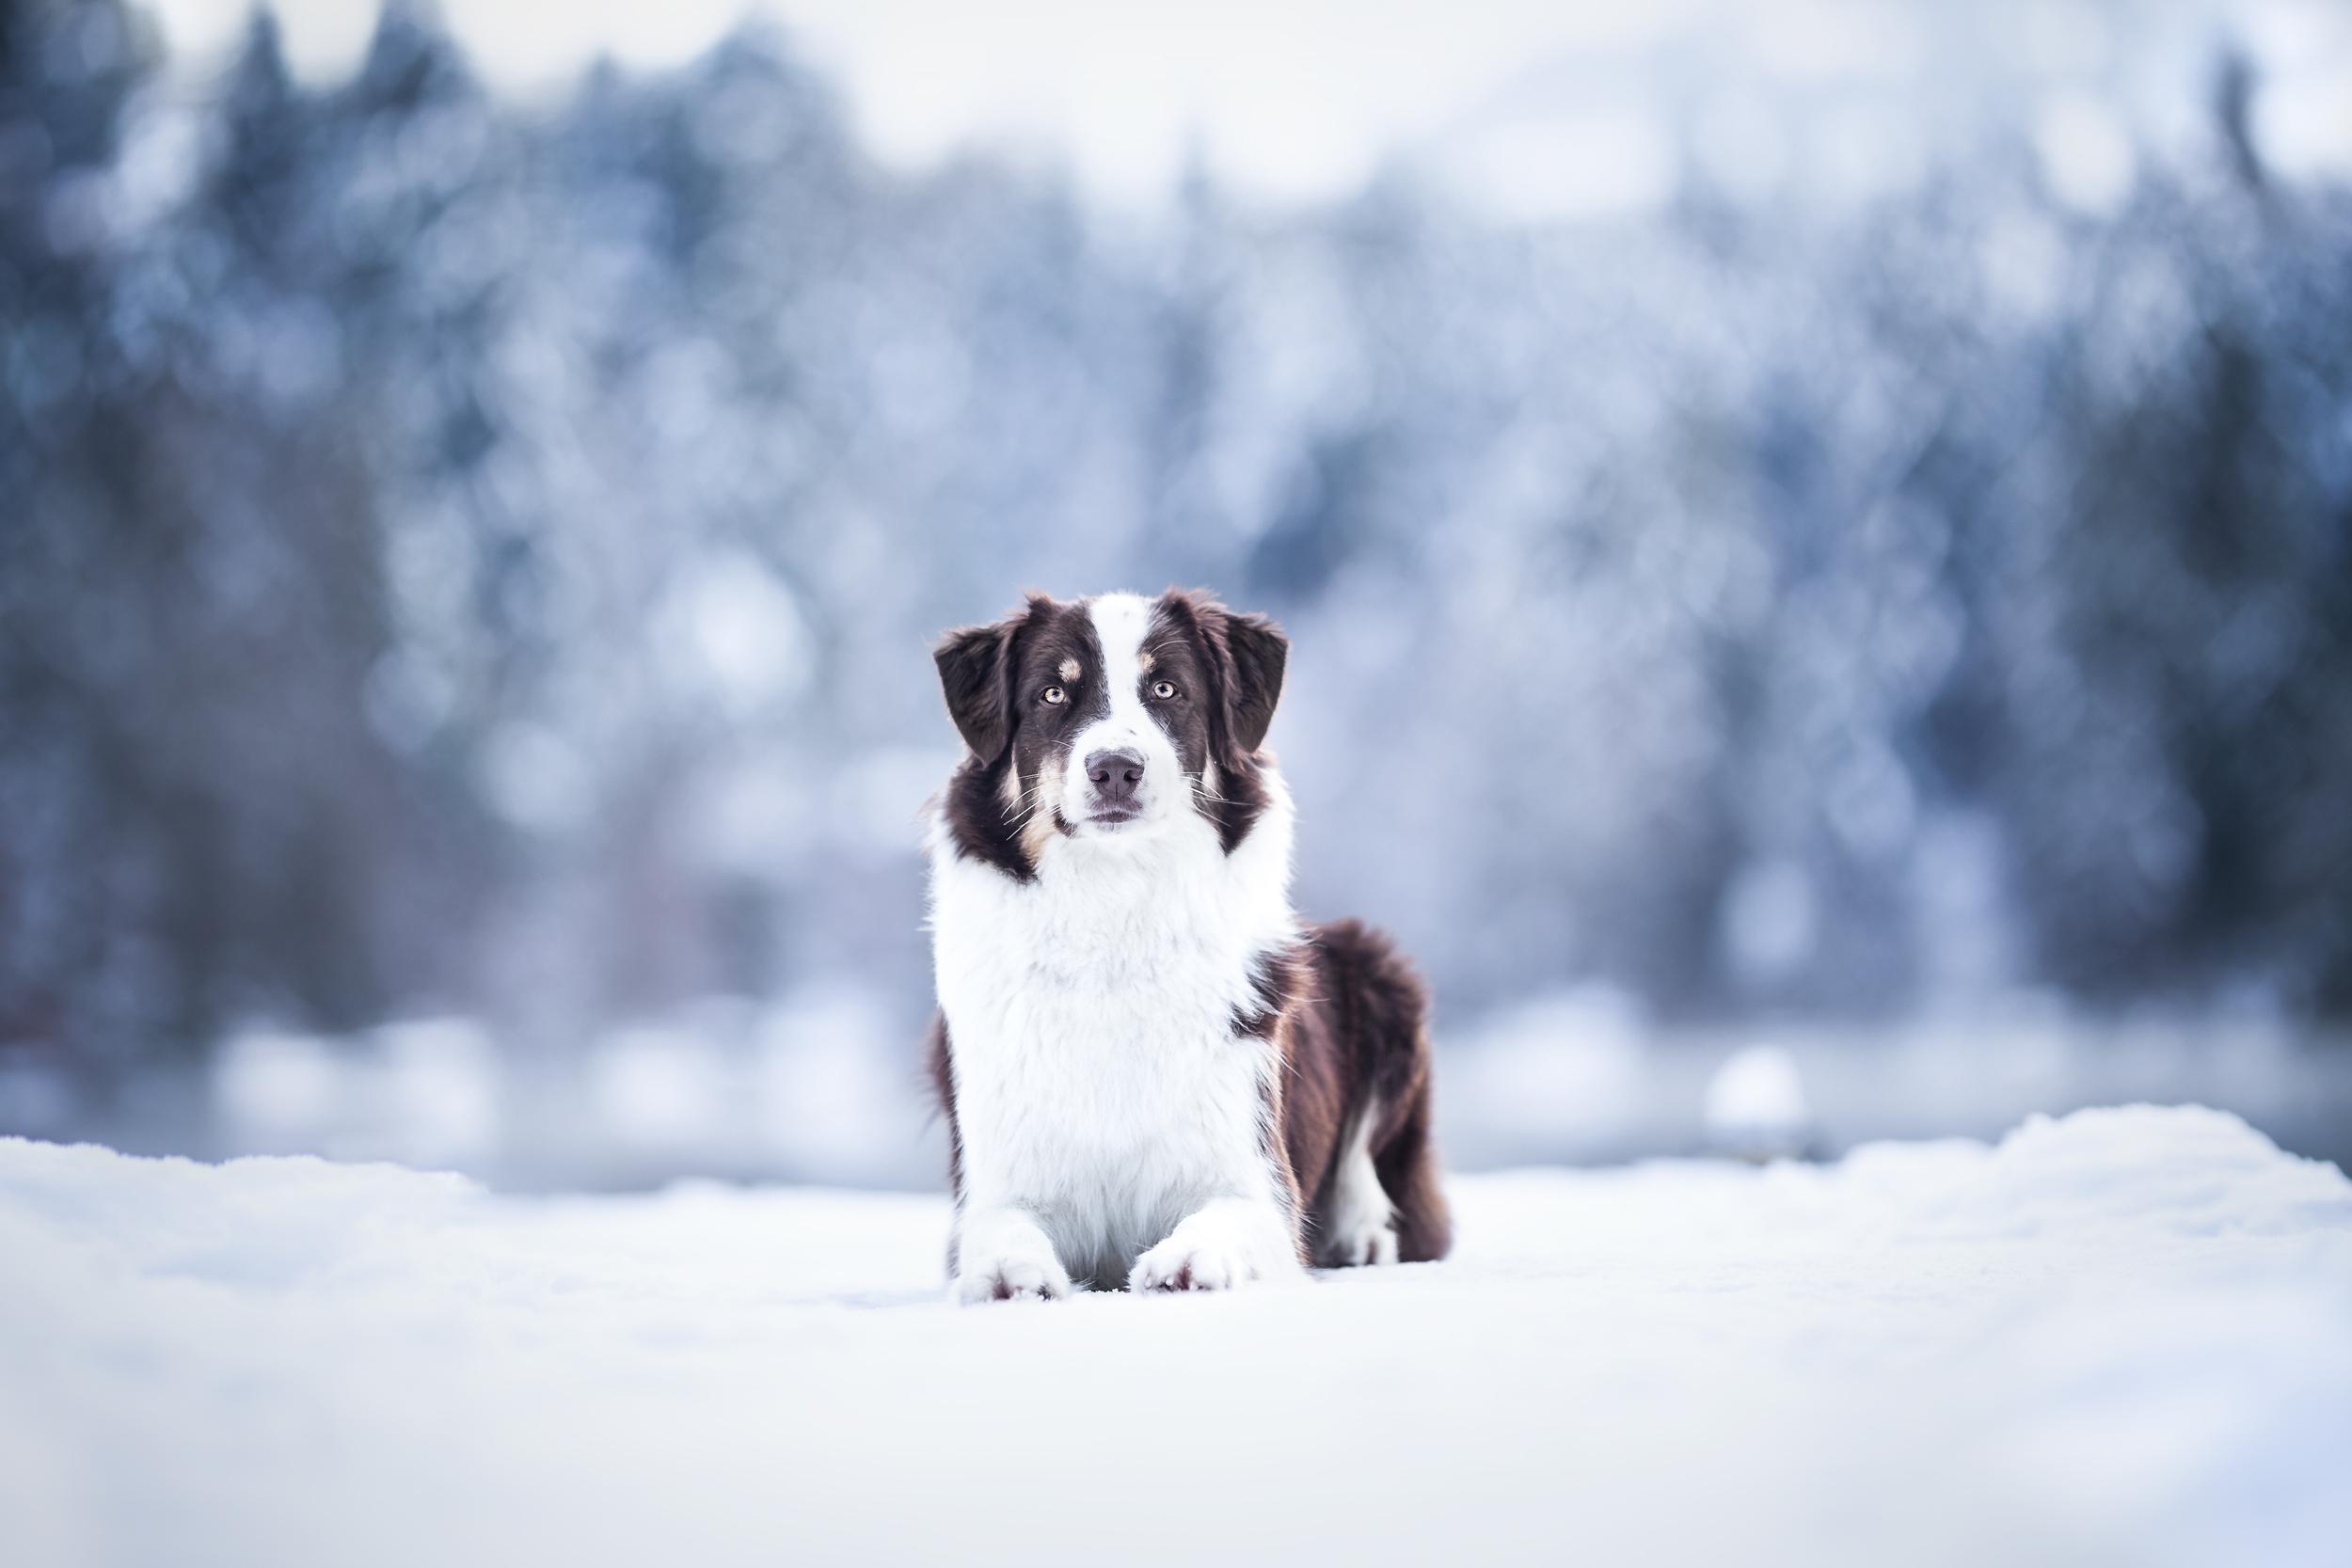 Hundefotografie Schweiz Australian Shepherd Schnee Photo-Passion Denise Czichocki-